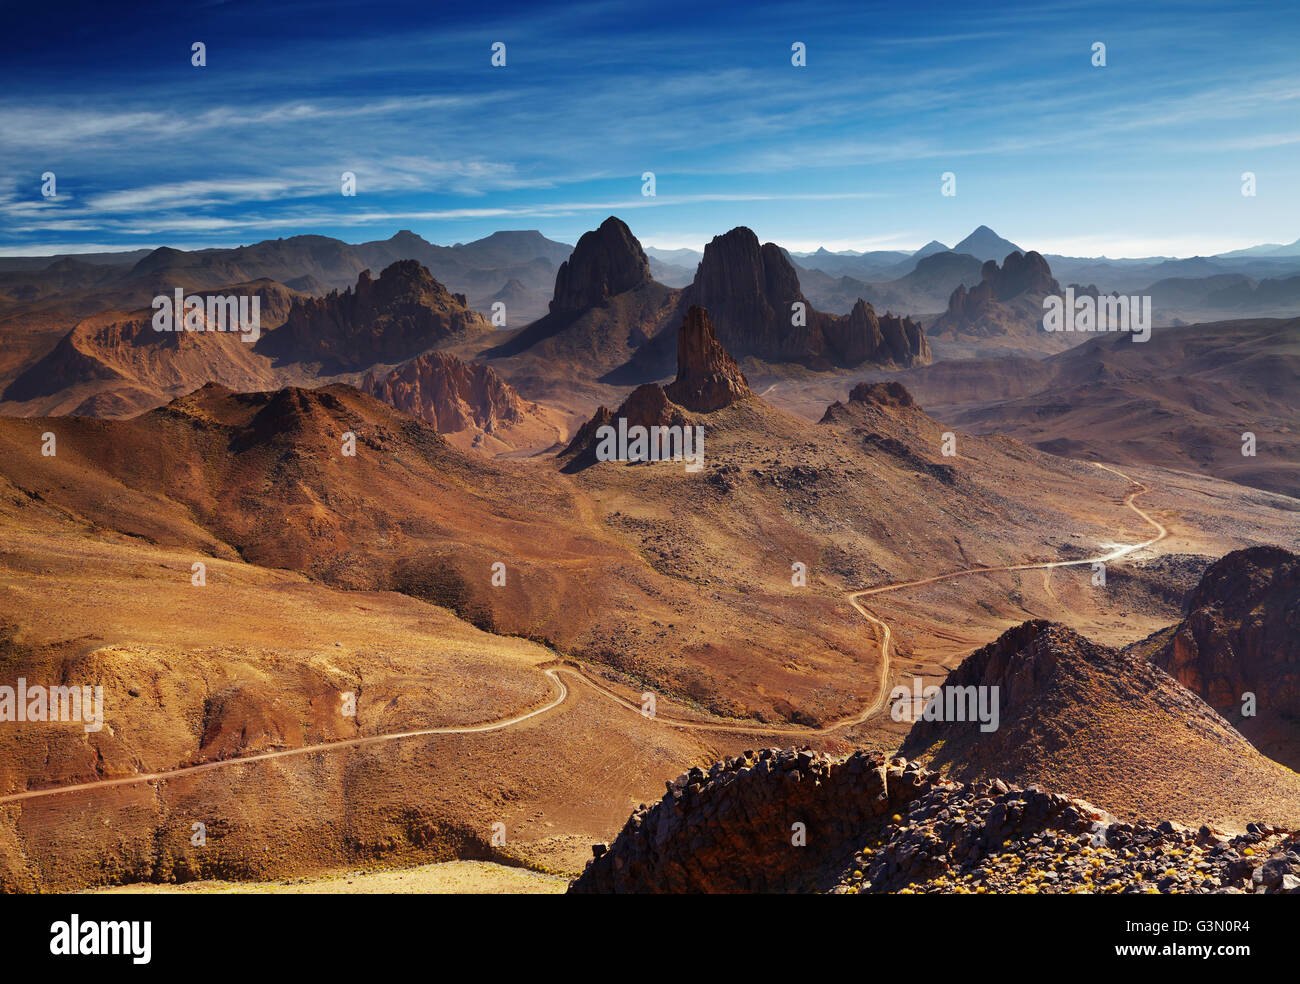 Deserto del Sahara, montagne Hoggar, Algeria, vista da Assekrem pass Immagini Stock